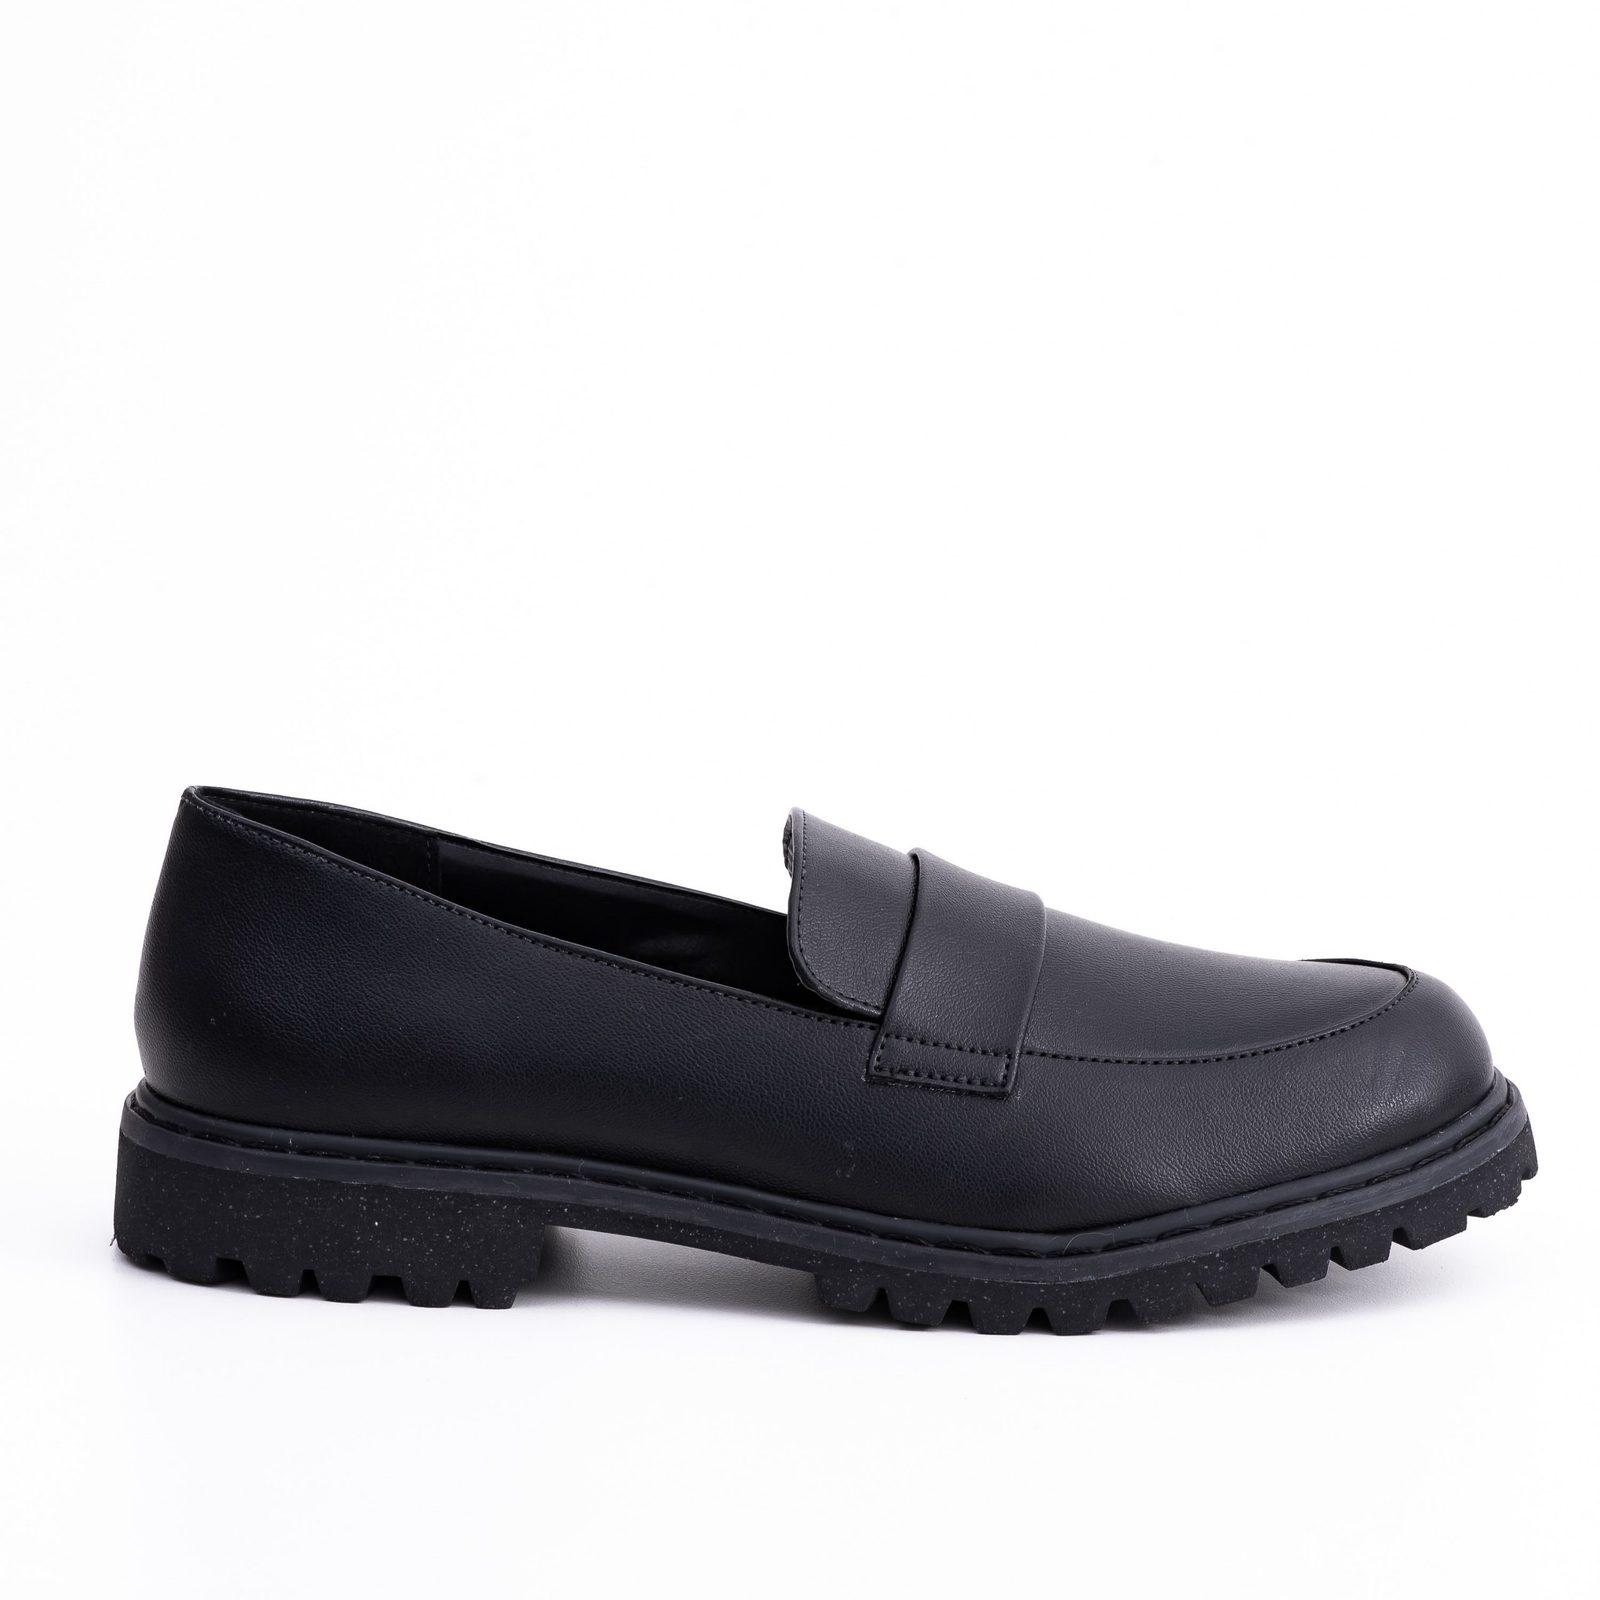 Loafer Aura All Black